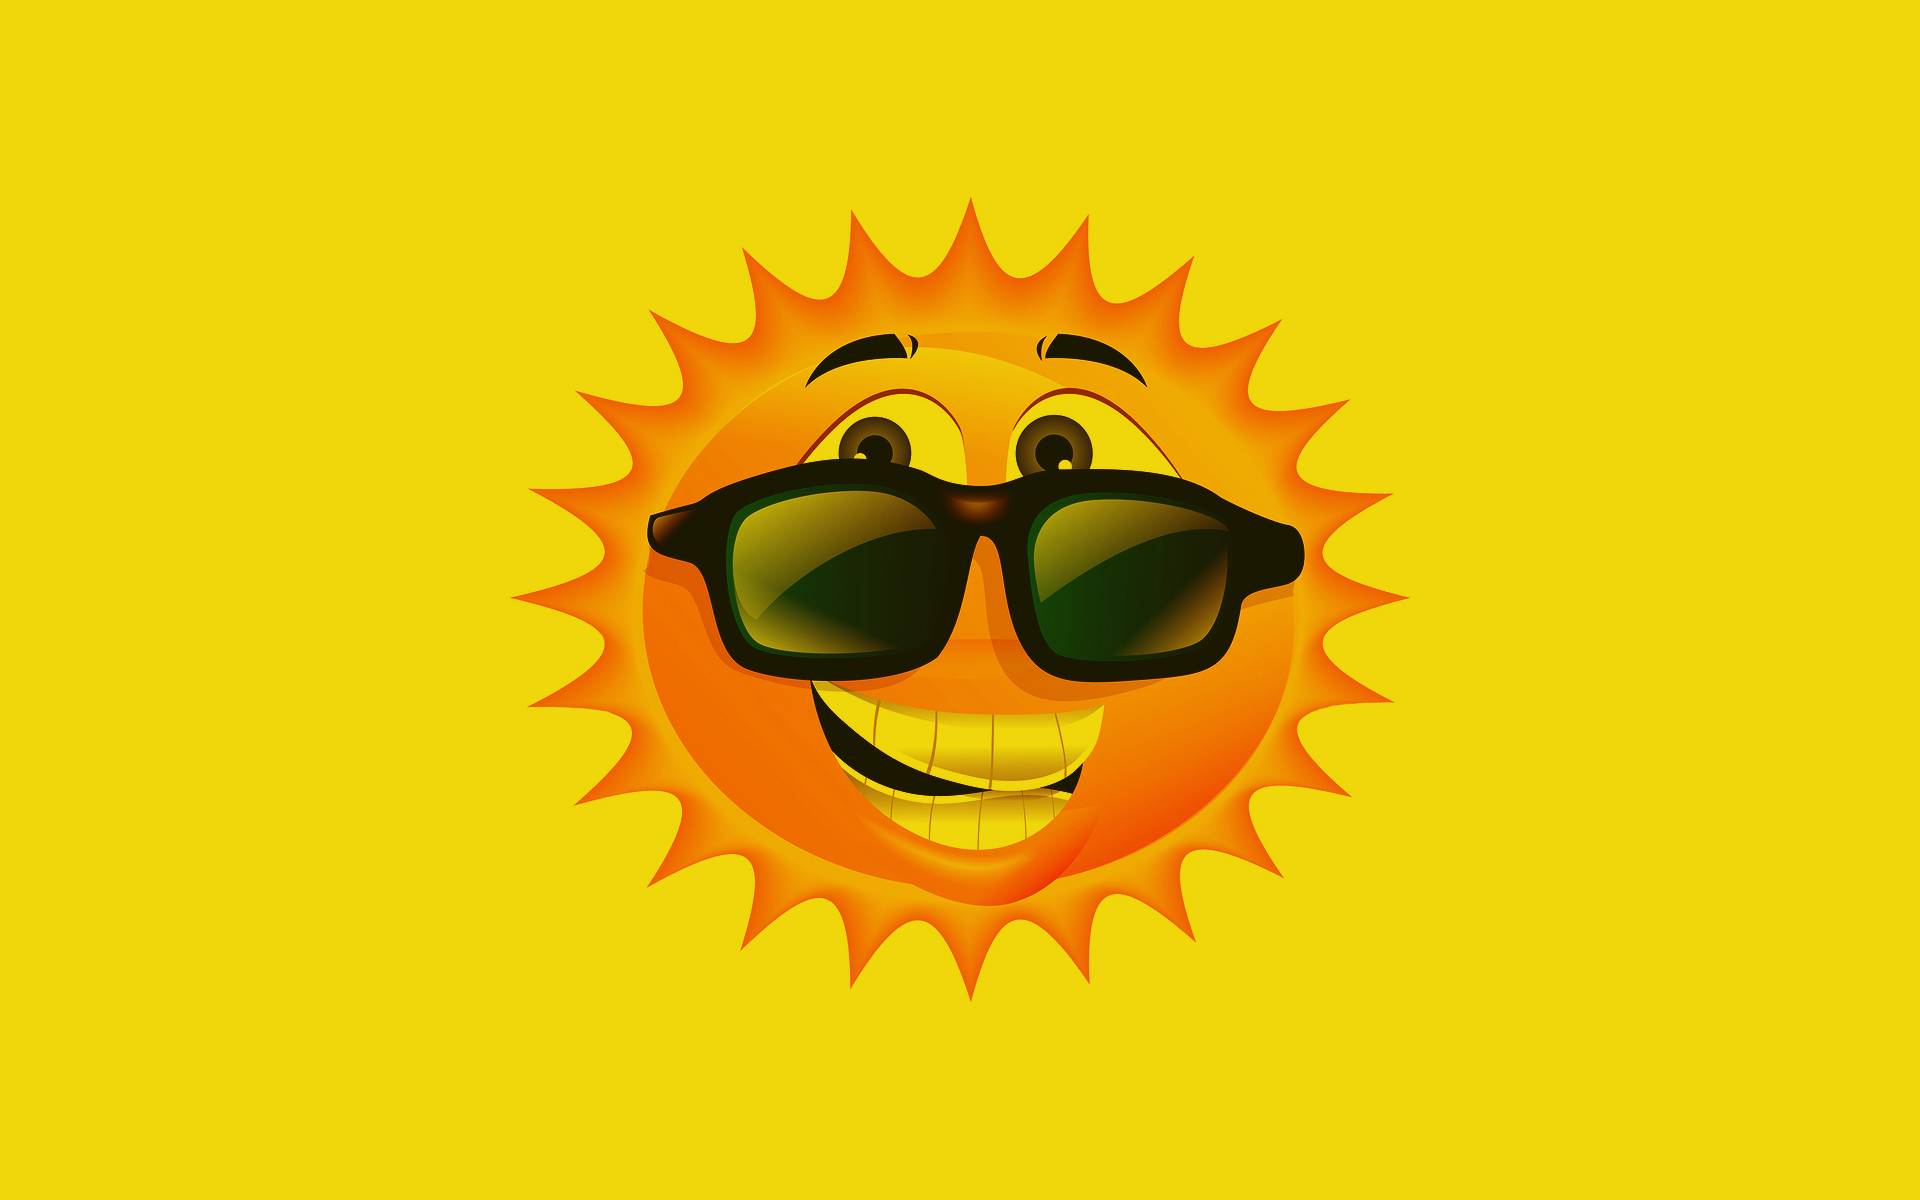 anime sunglasses